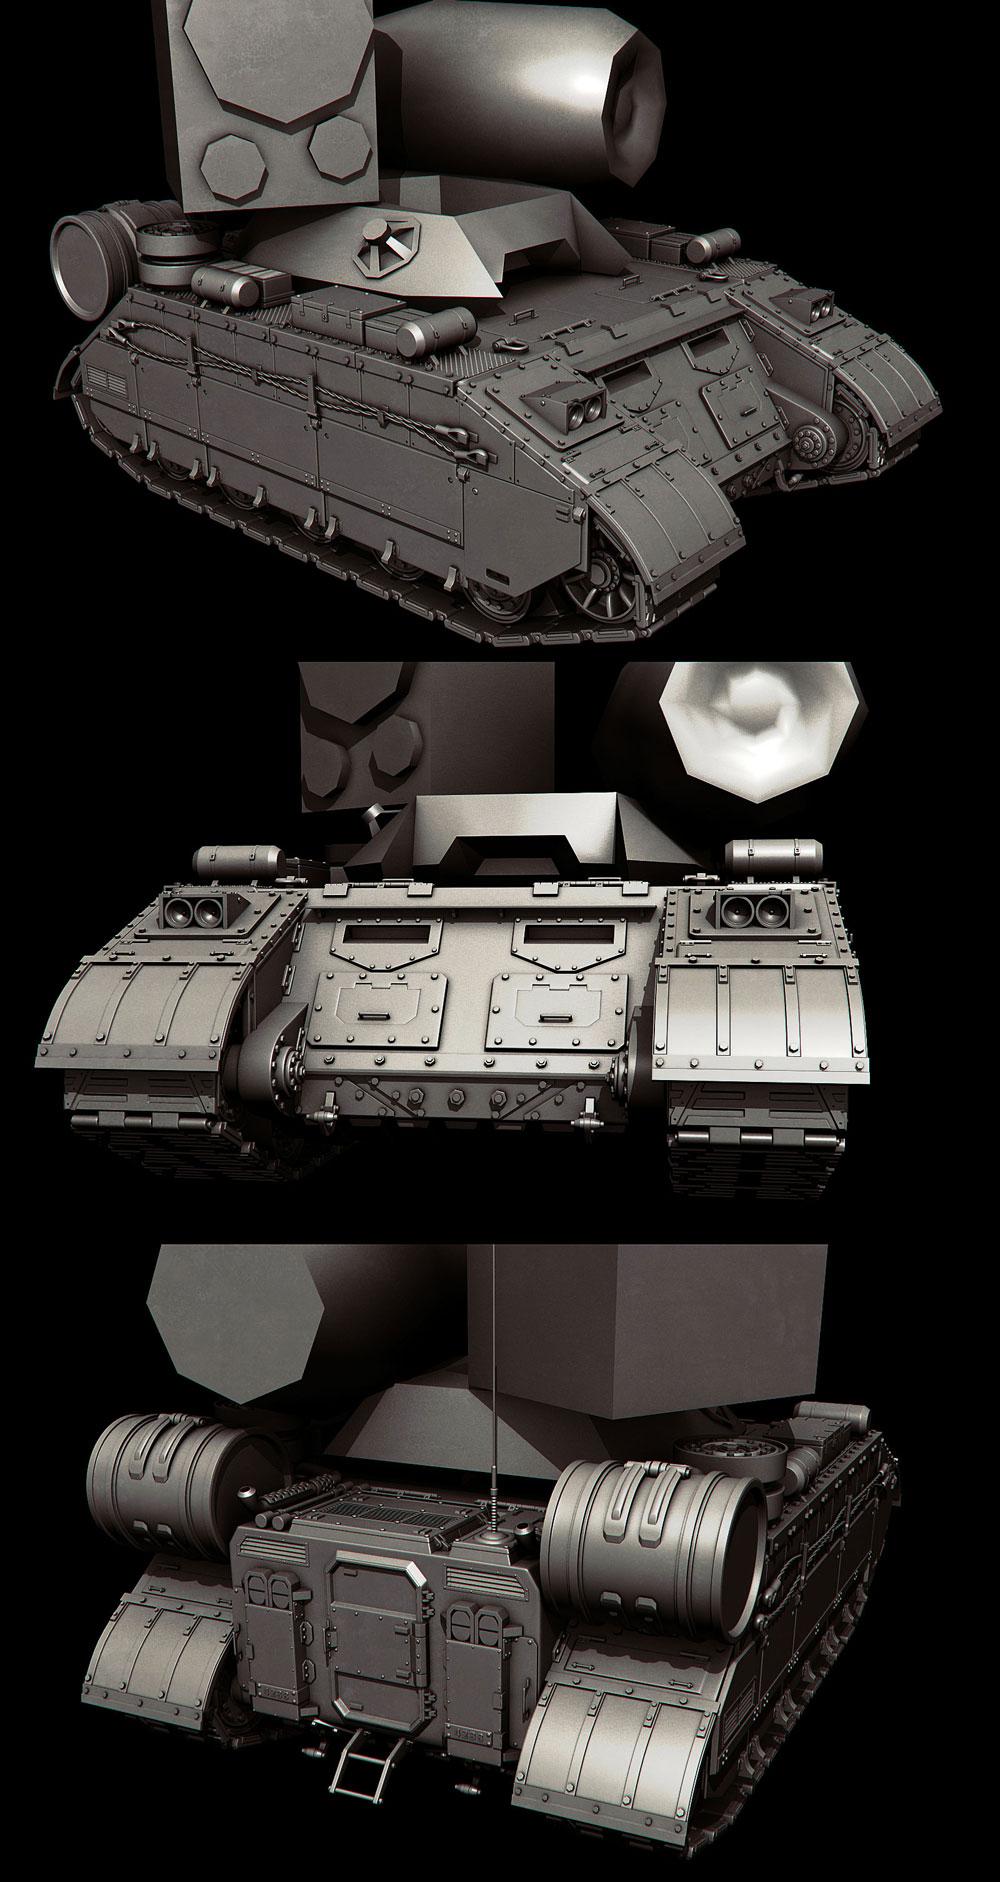 BoomBoom_Tank